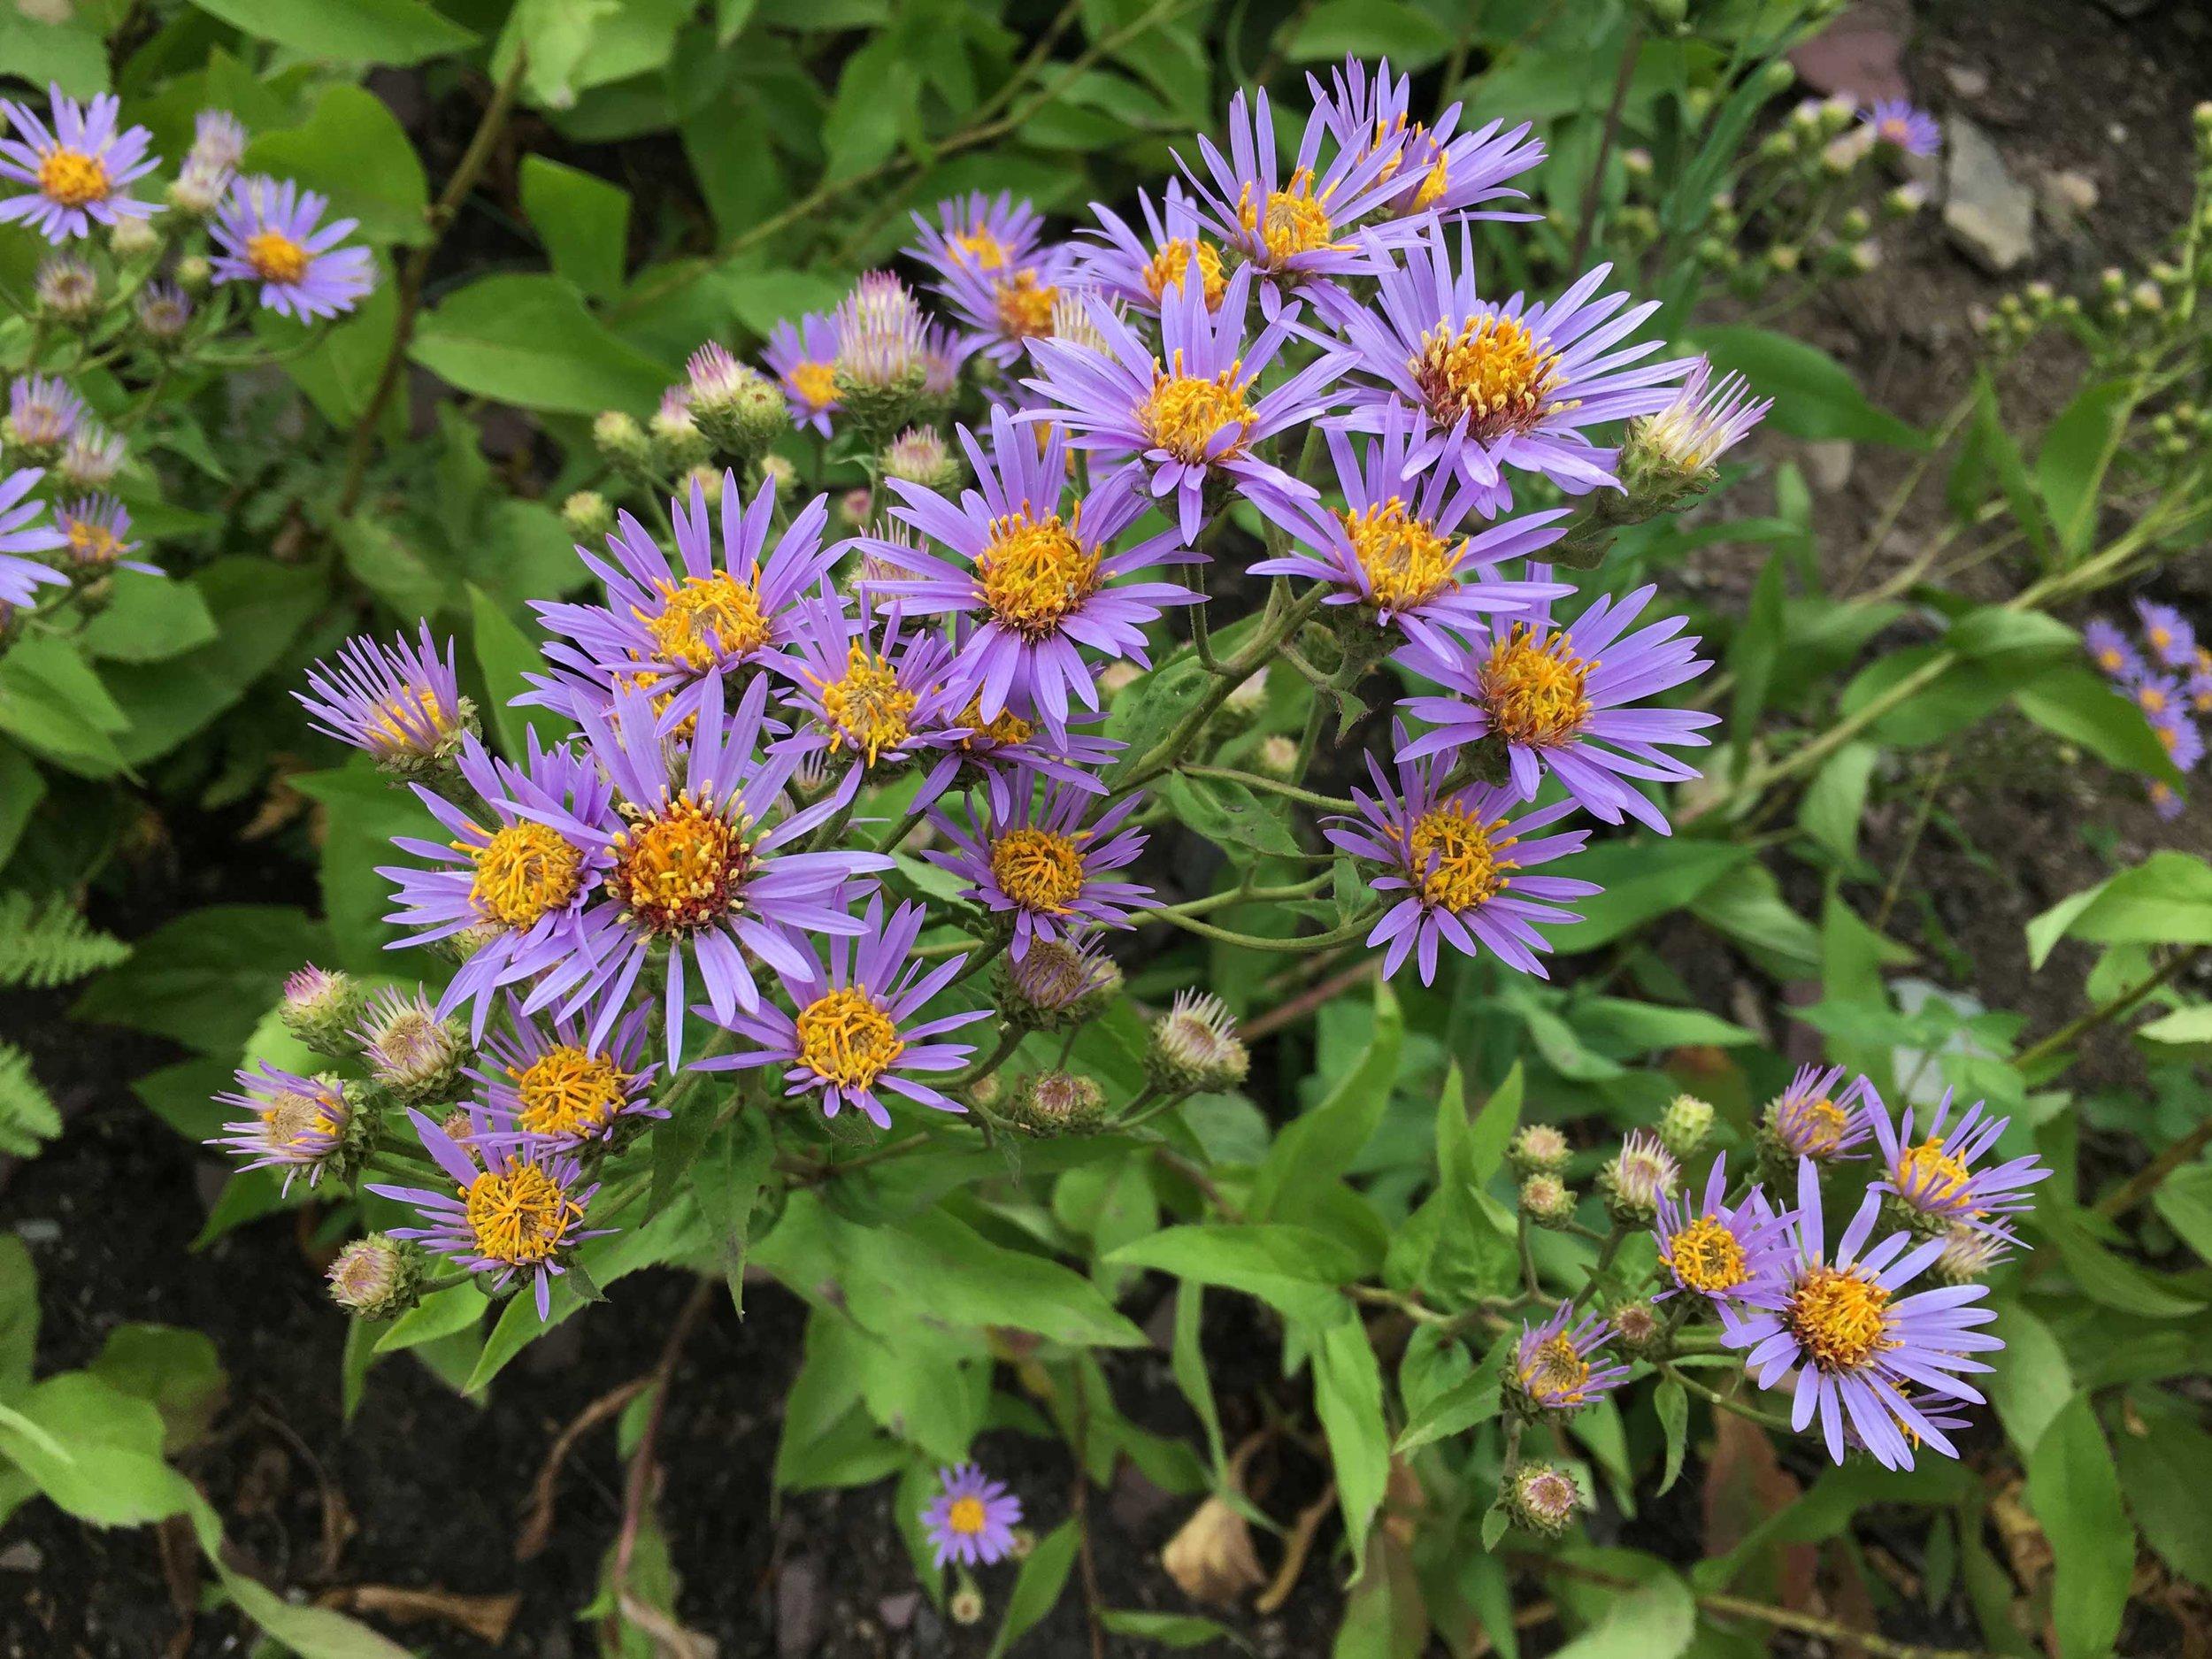 Summer wildflowers in the Two Medicine region.